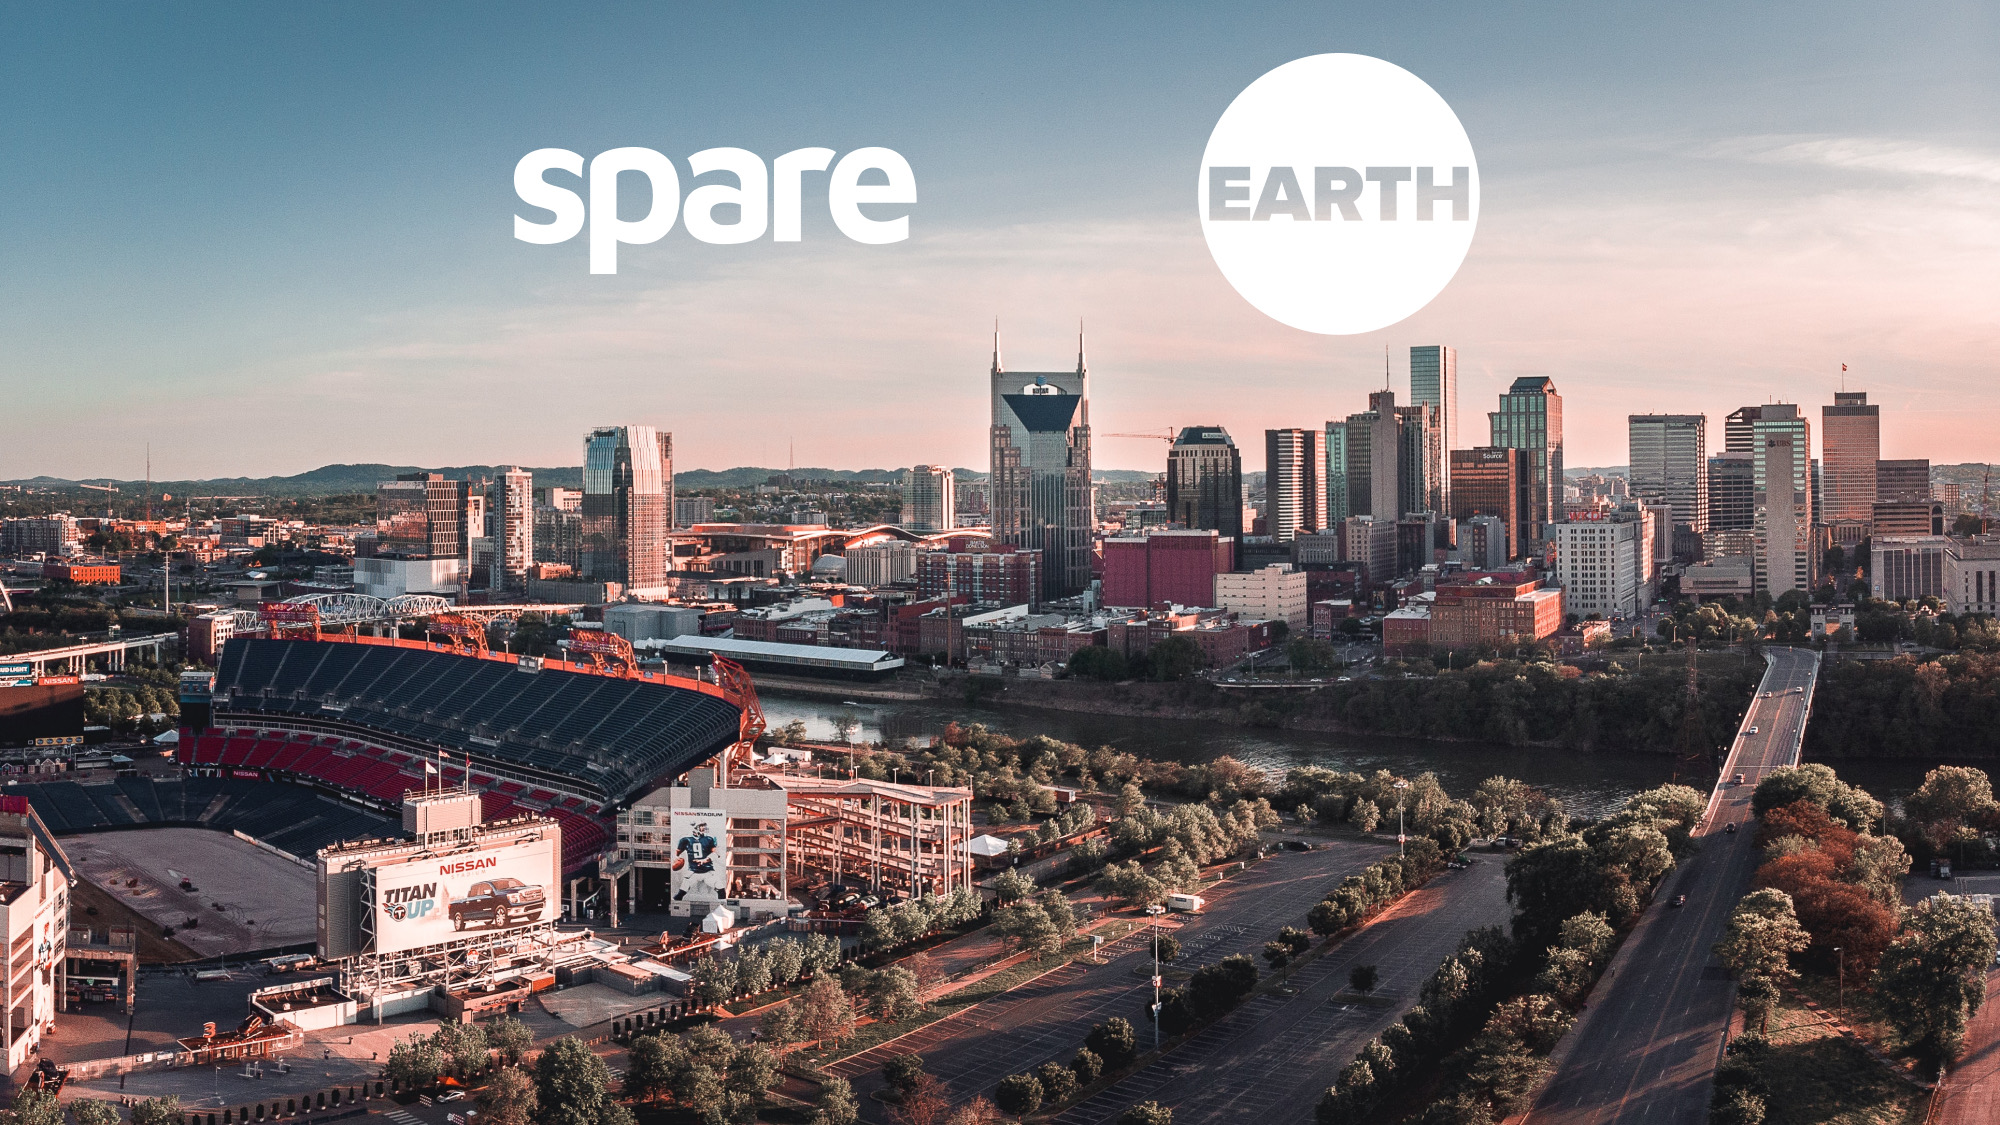 Spare, Earth Rides Team To Provide Zero-Emission Rides In Nashville